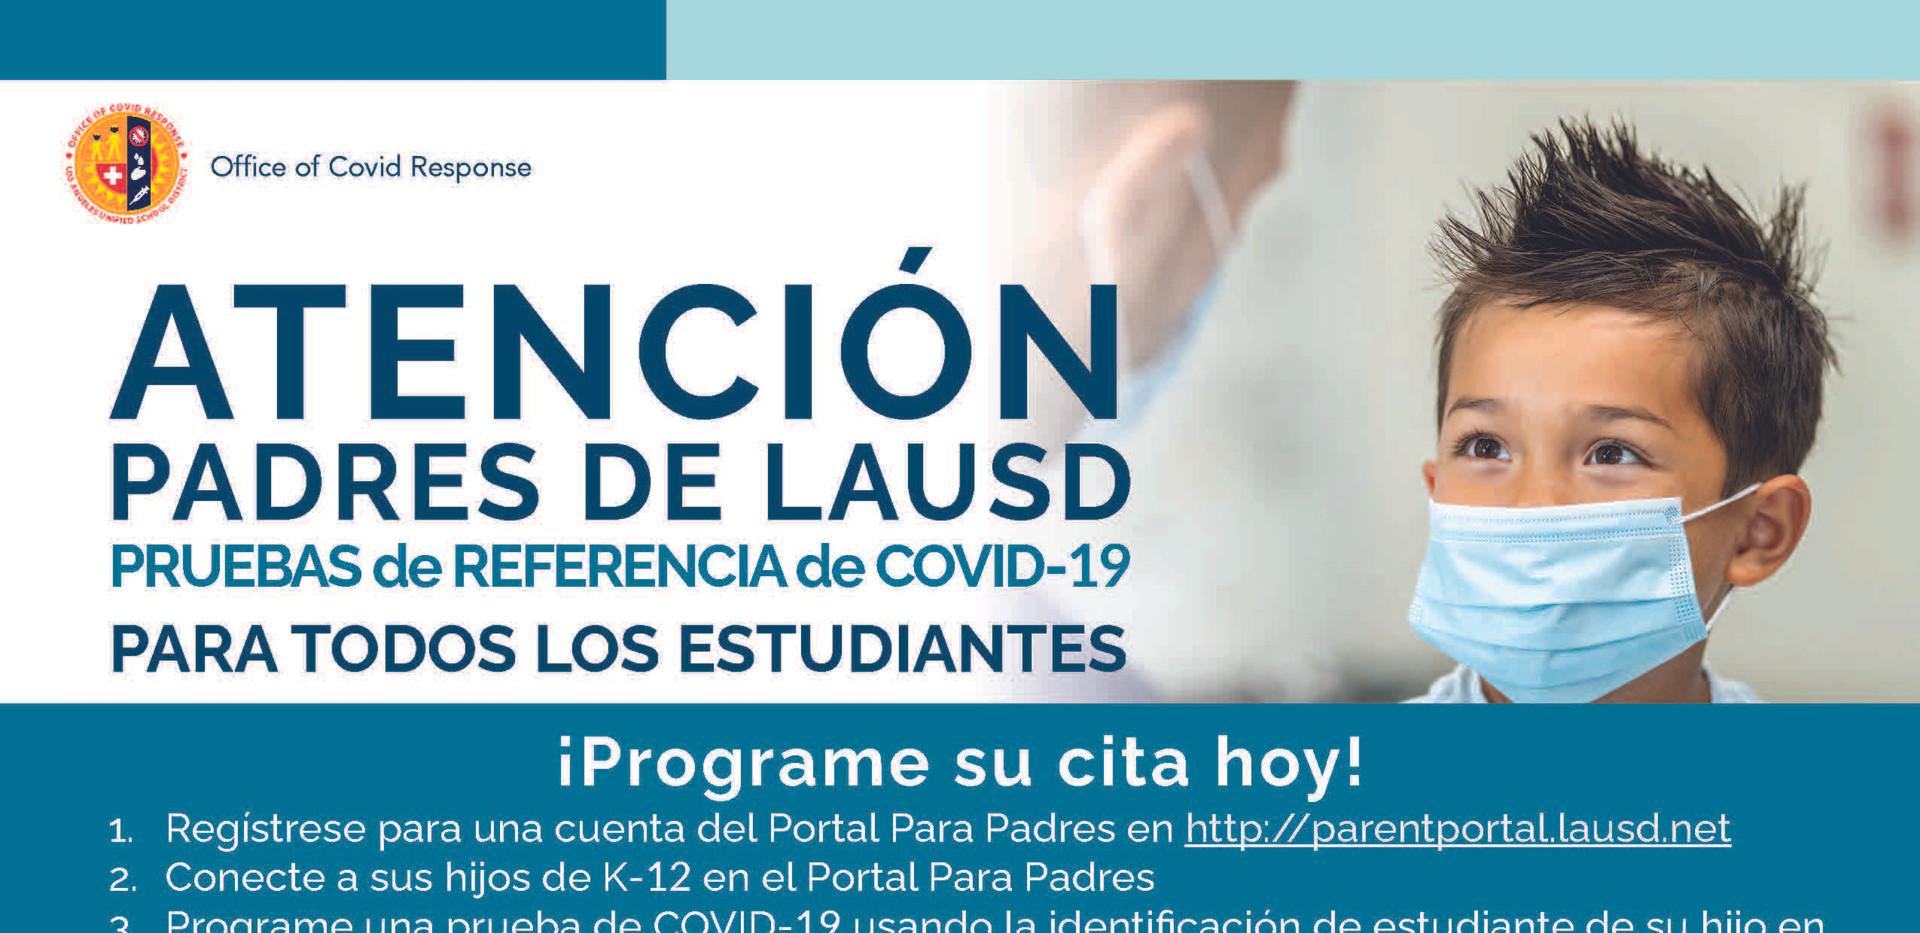 StudentCovidTestingFlyer_Spanish_3.31.21